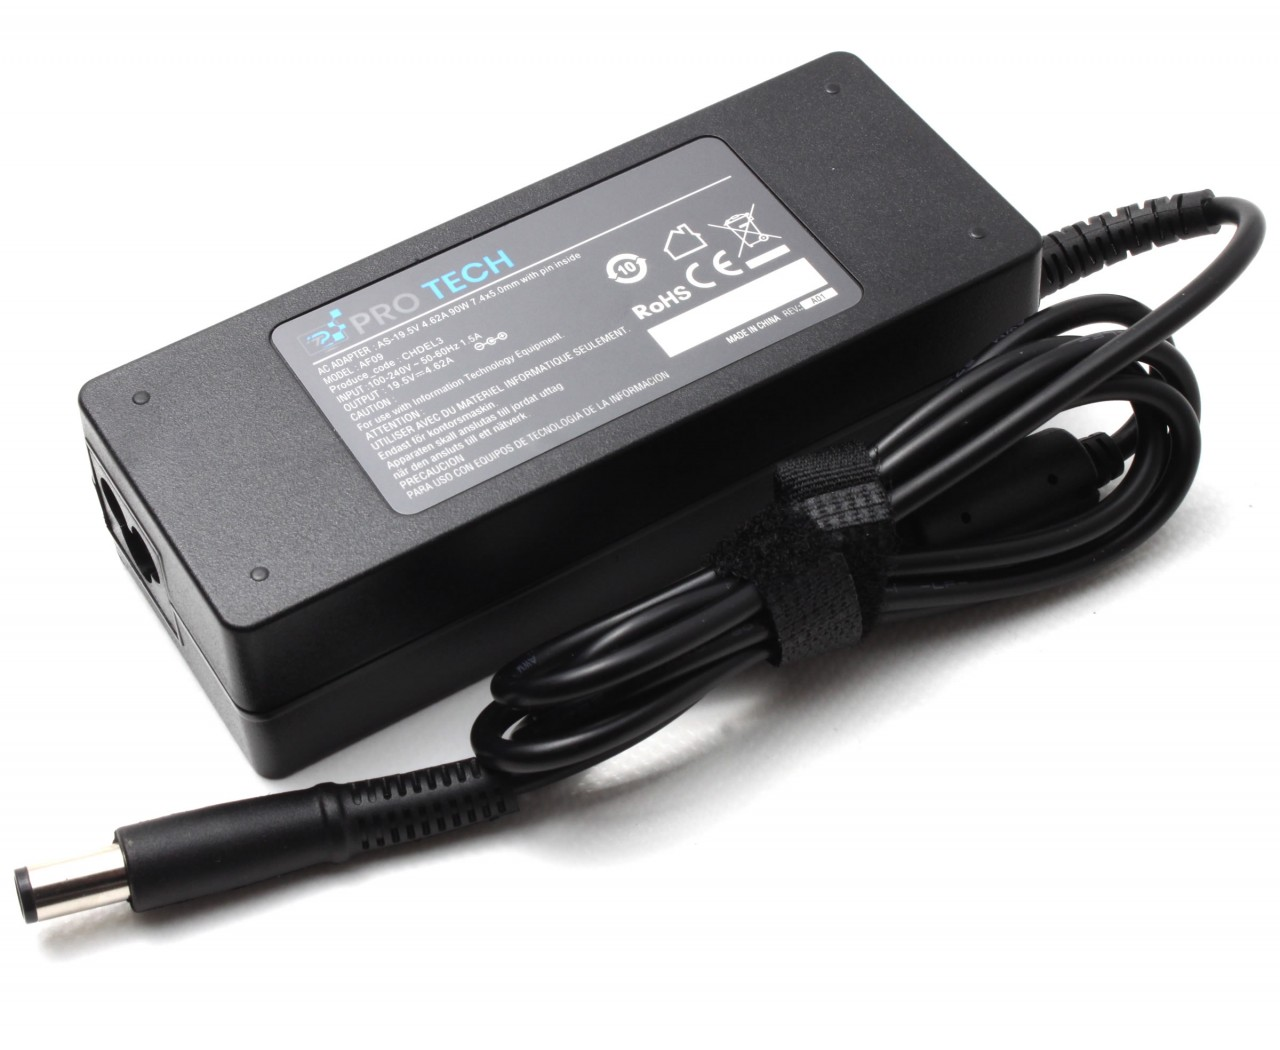 Incarcator Dell Inspiron M4040 Replacement imagine powerlaptop.ro 2021